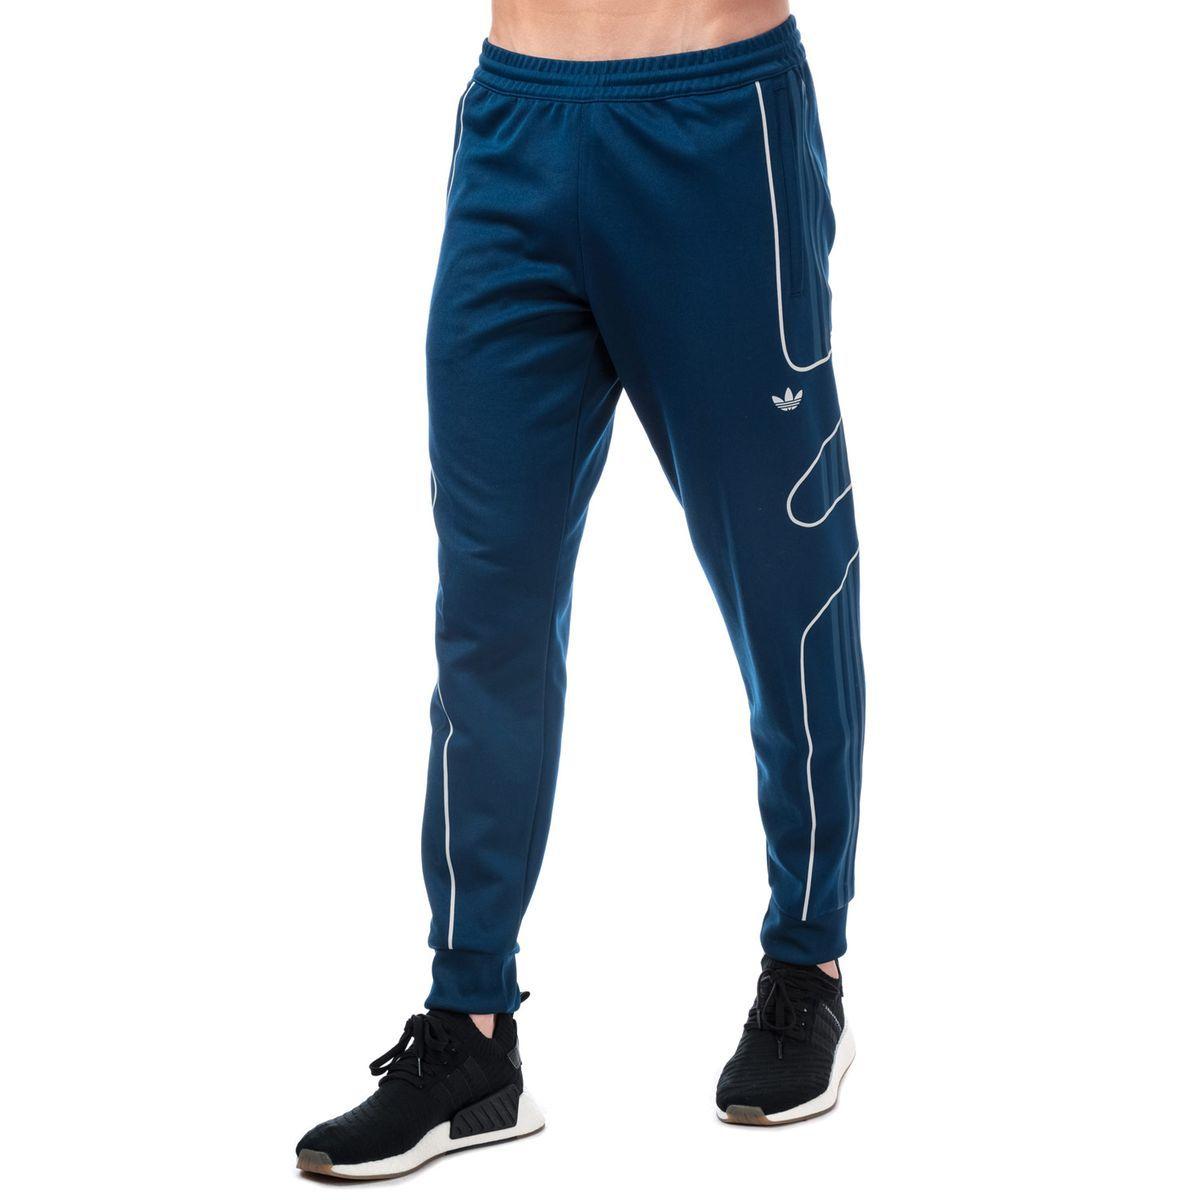 pantalon homme adidas coton